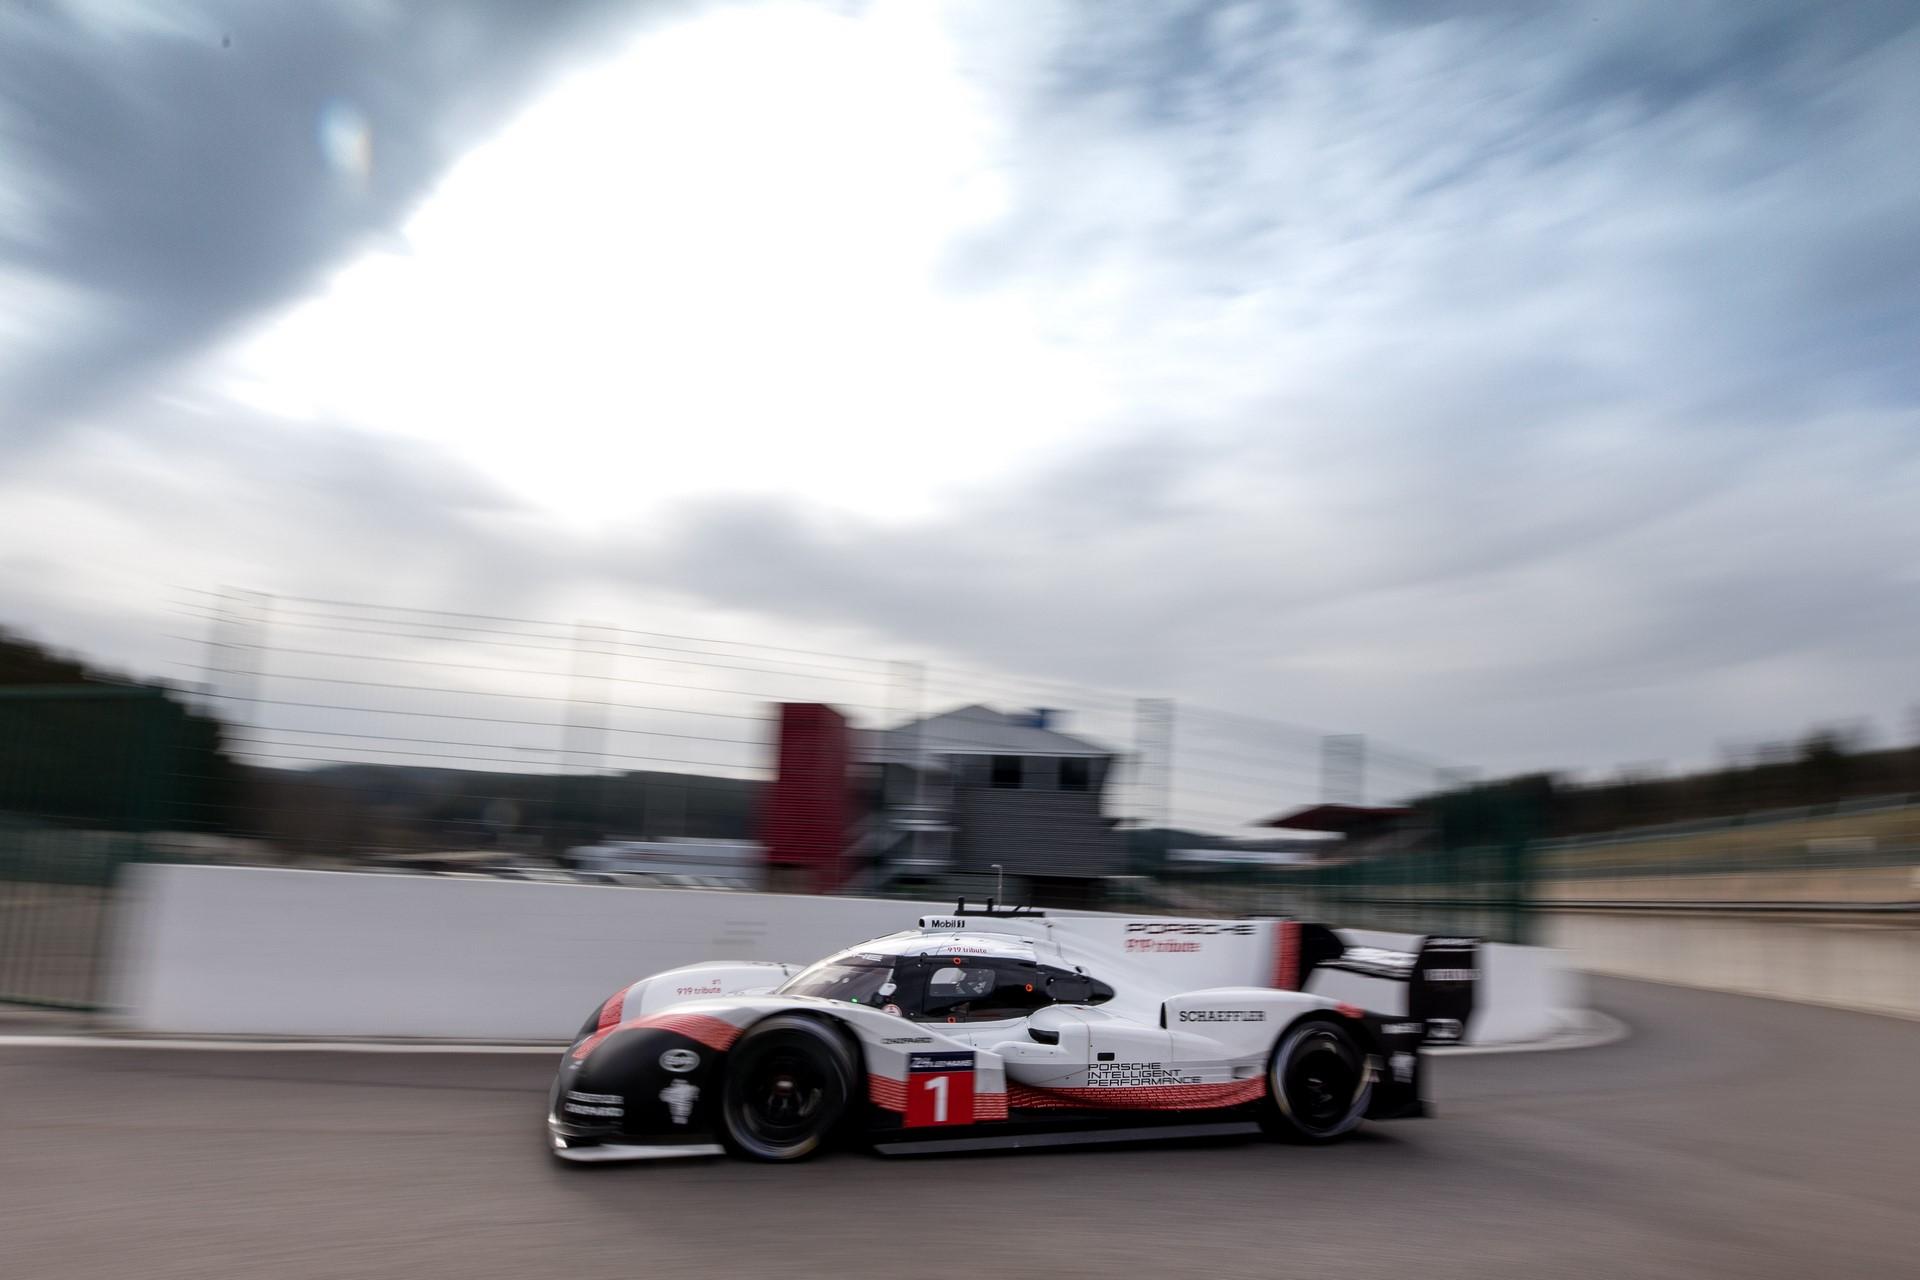 Porsche 919 Hybrid Evo Spa Record (6)